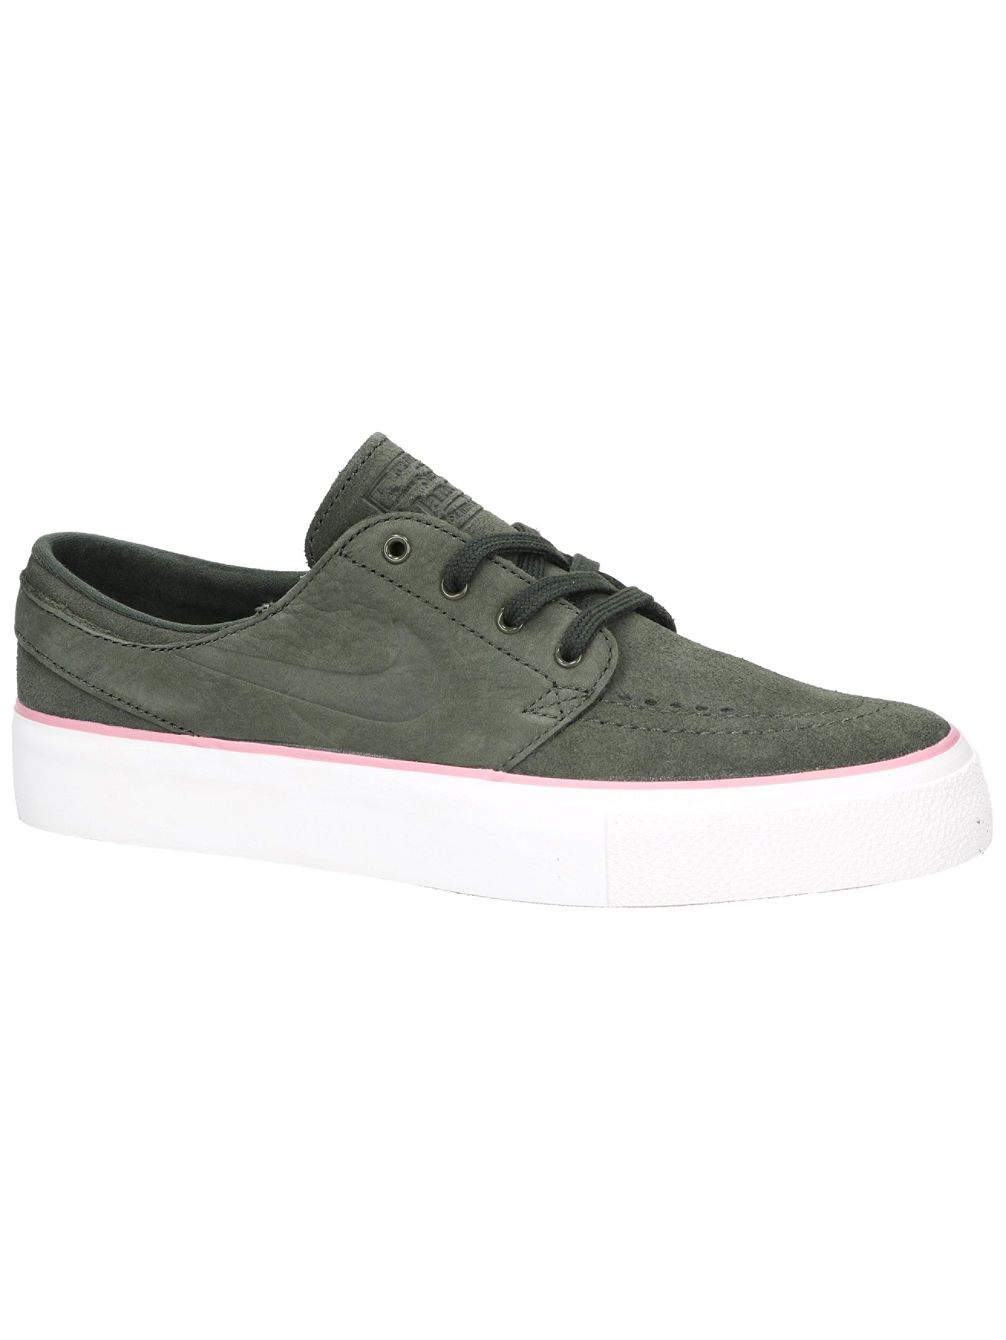 lowest price a7f30 5e174 SB Zoom Stefan Janoski HT Skate Shoes Boys. Nike